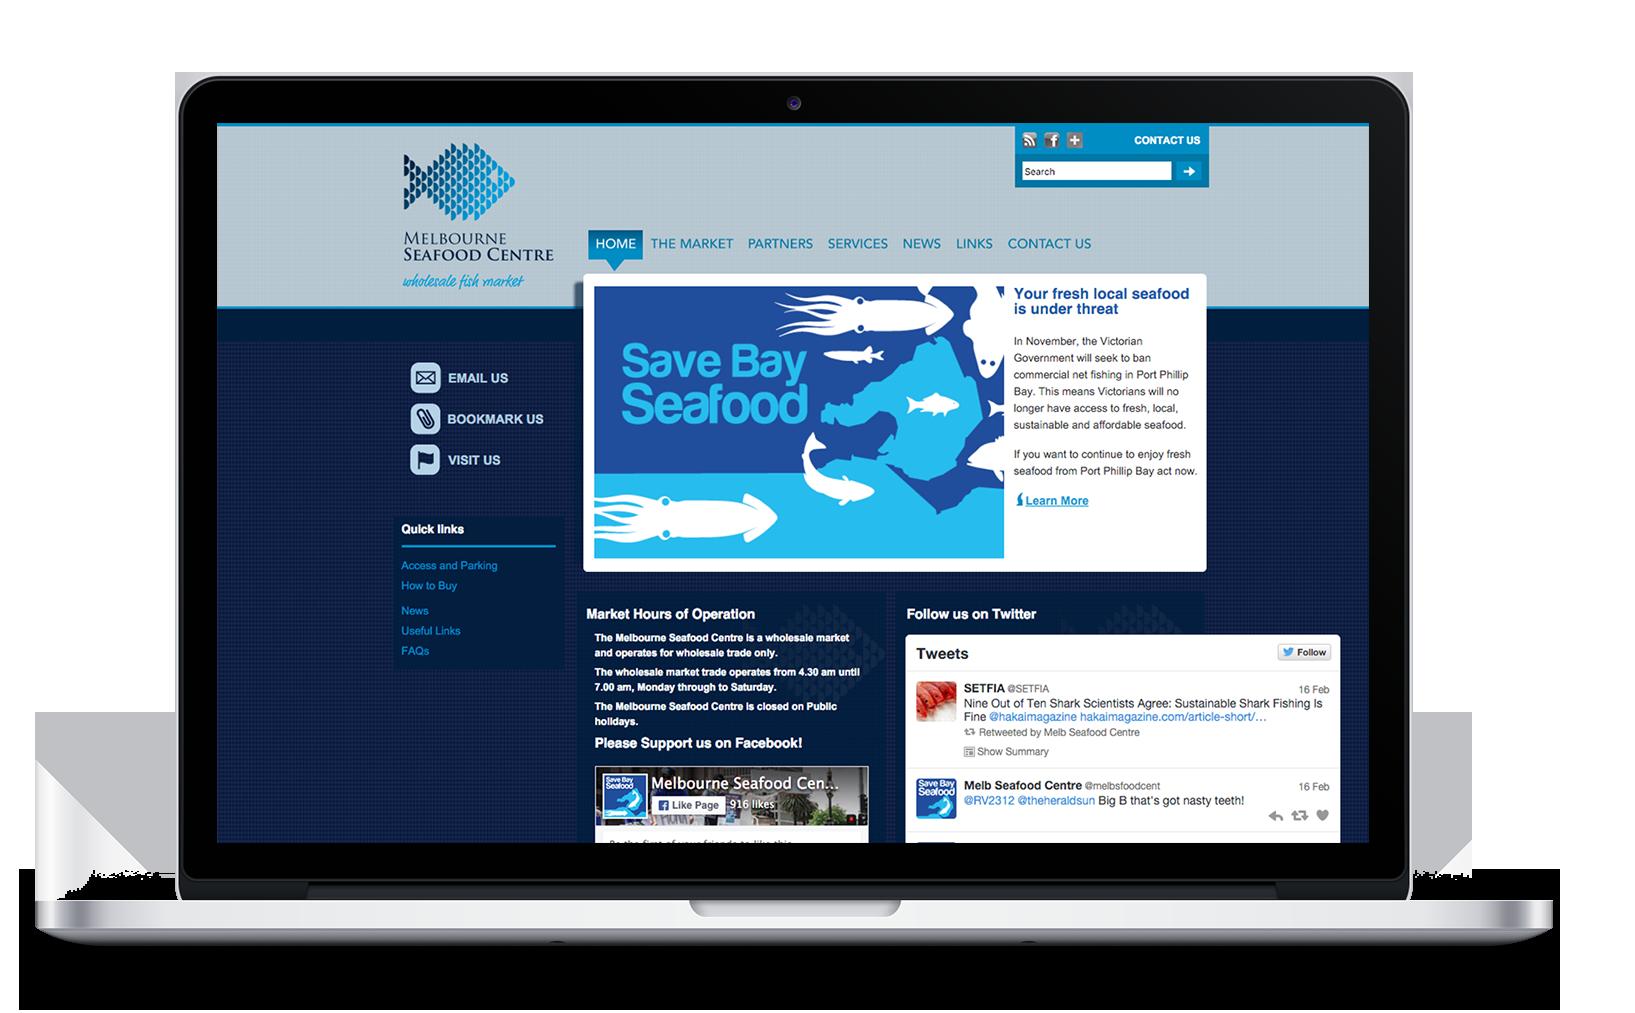 Melbourne-Seafood-Centre-presentation